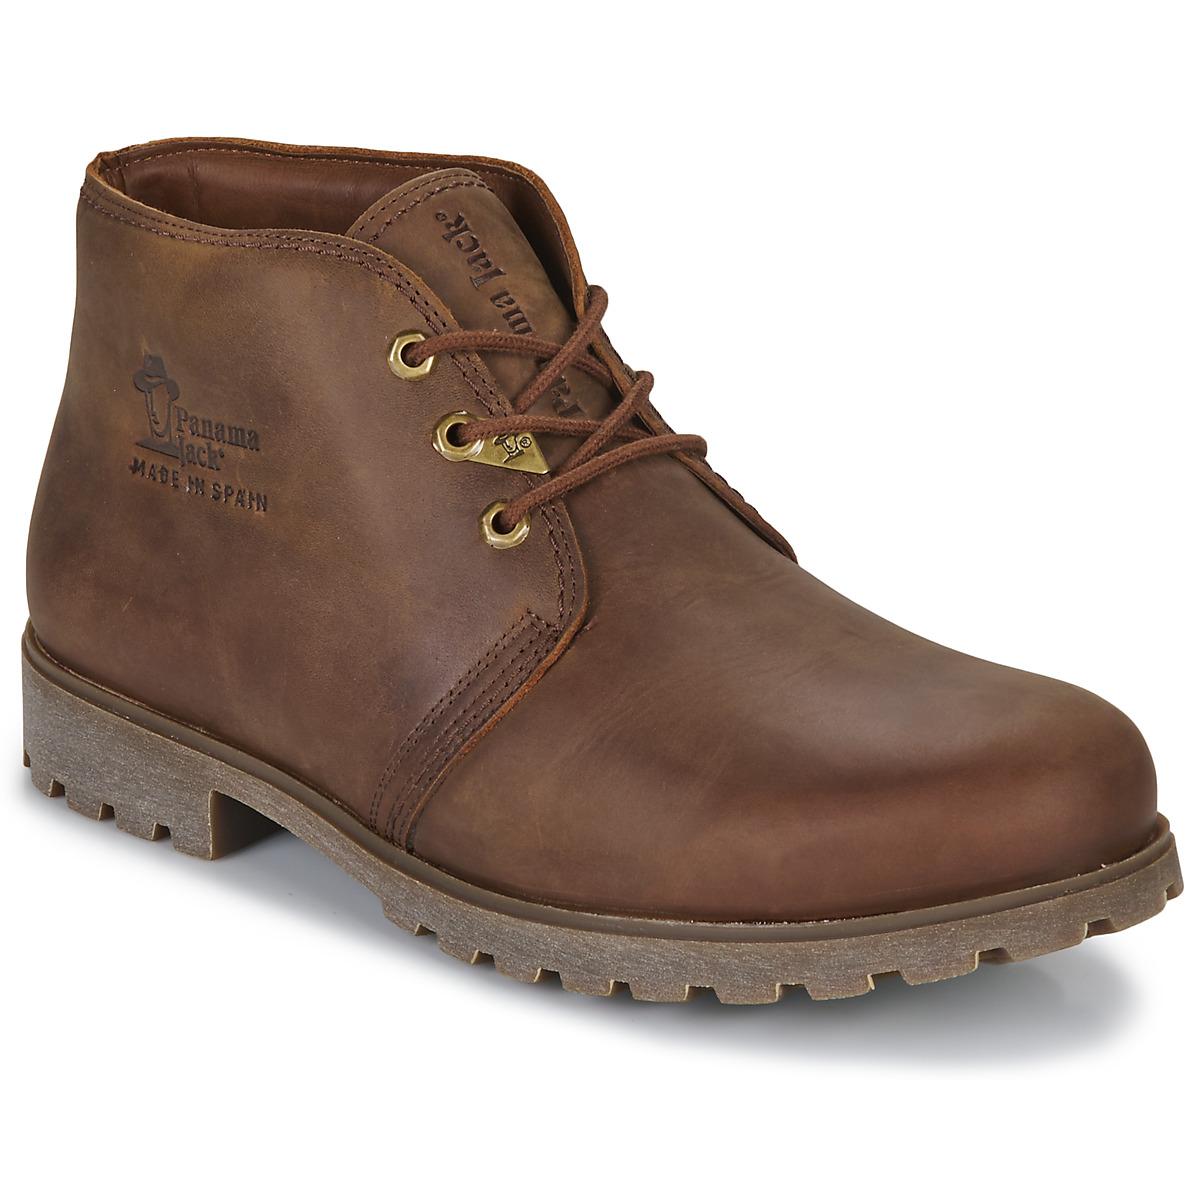 Panama Jack BOTA PANAMA Braun - Kostenloser Versand bei Spartoode ! - Schuhe Boots Herren 149,00 €